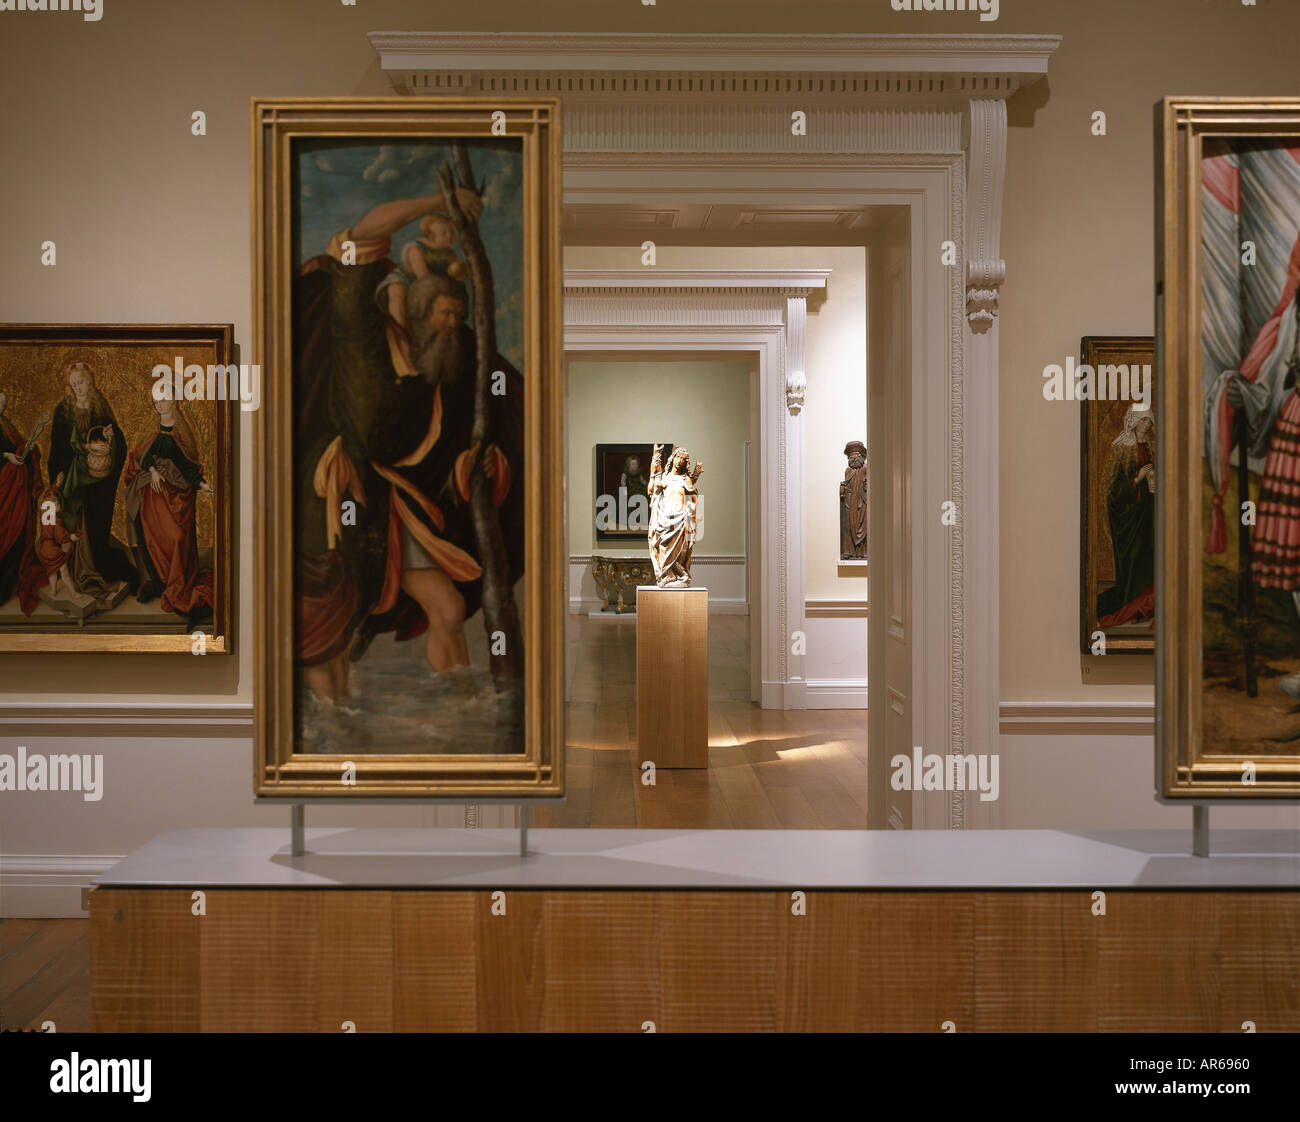 Compton Verney, Warwickshire. German Gallery. Architect: Stanton Williams, Robert Adam - Stock Image